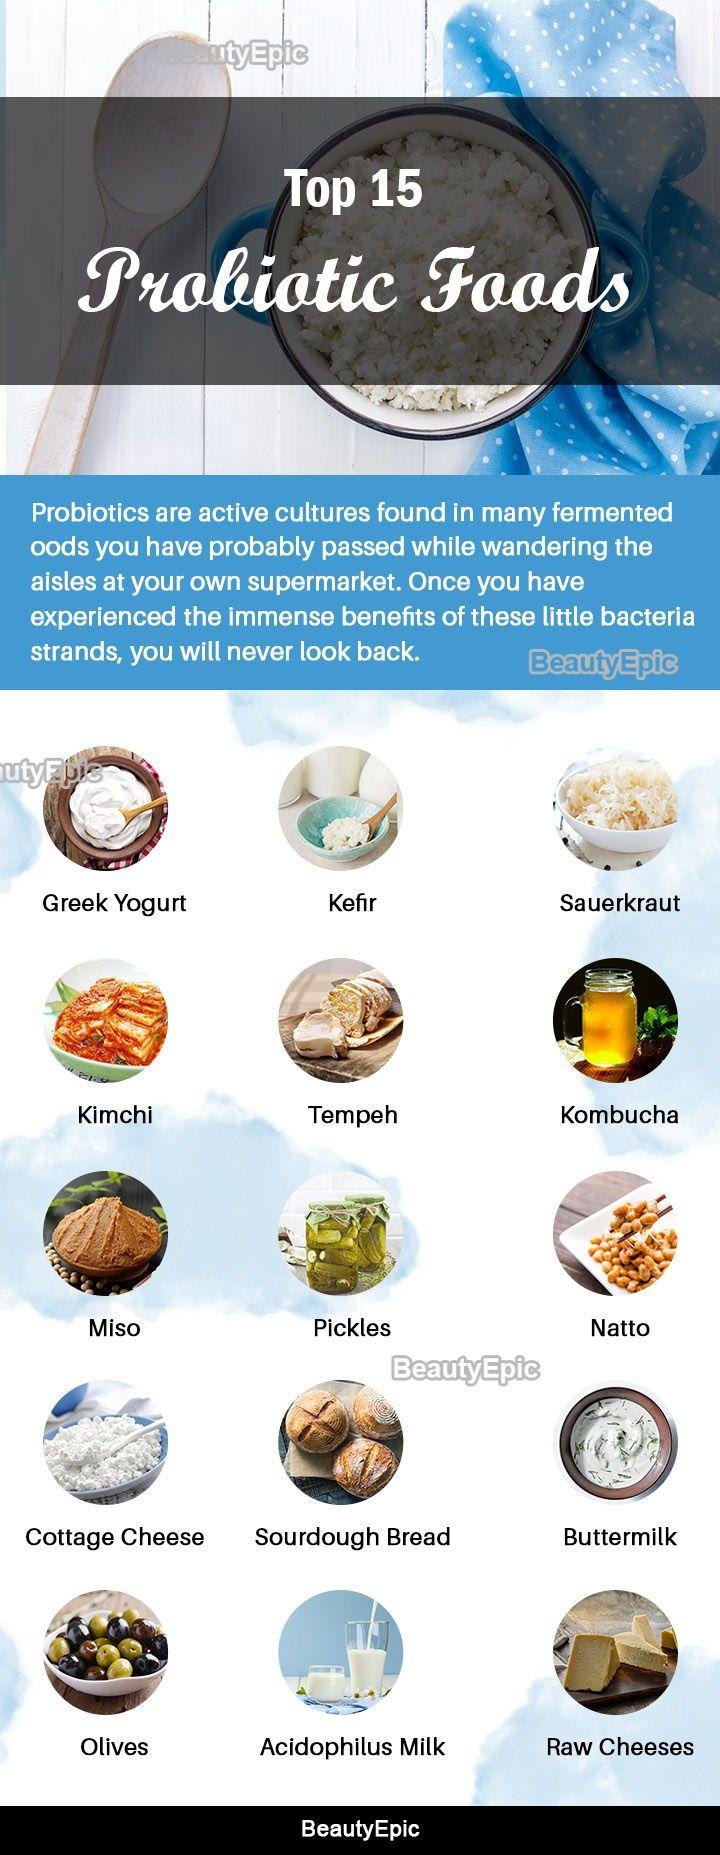 Top 15 Healthy Probiotic Foods For Your Gut Health Probiotic Foods Healthy Probiotics Probiotics